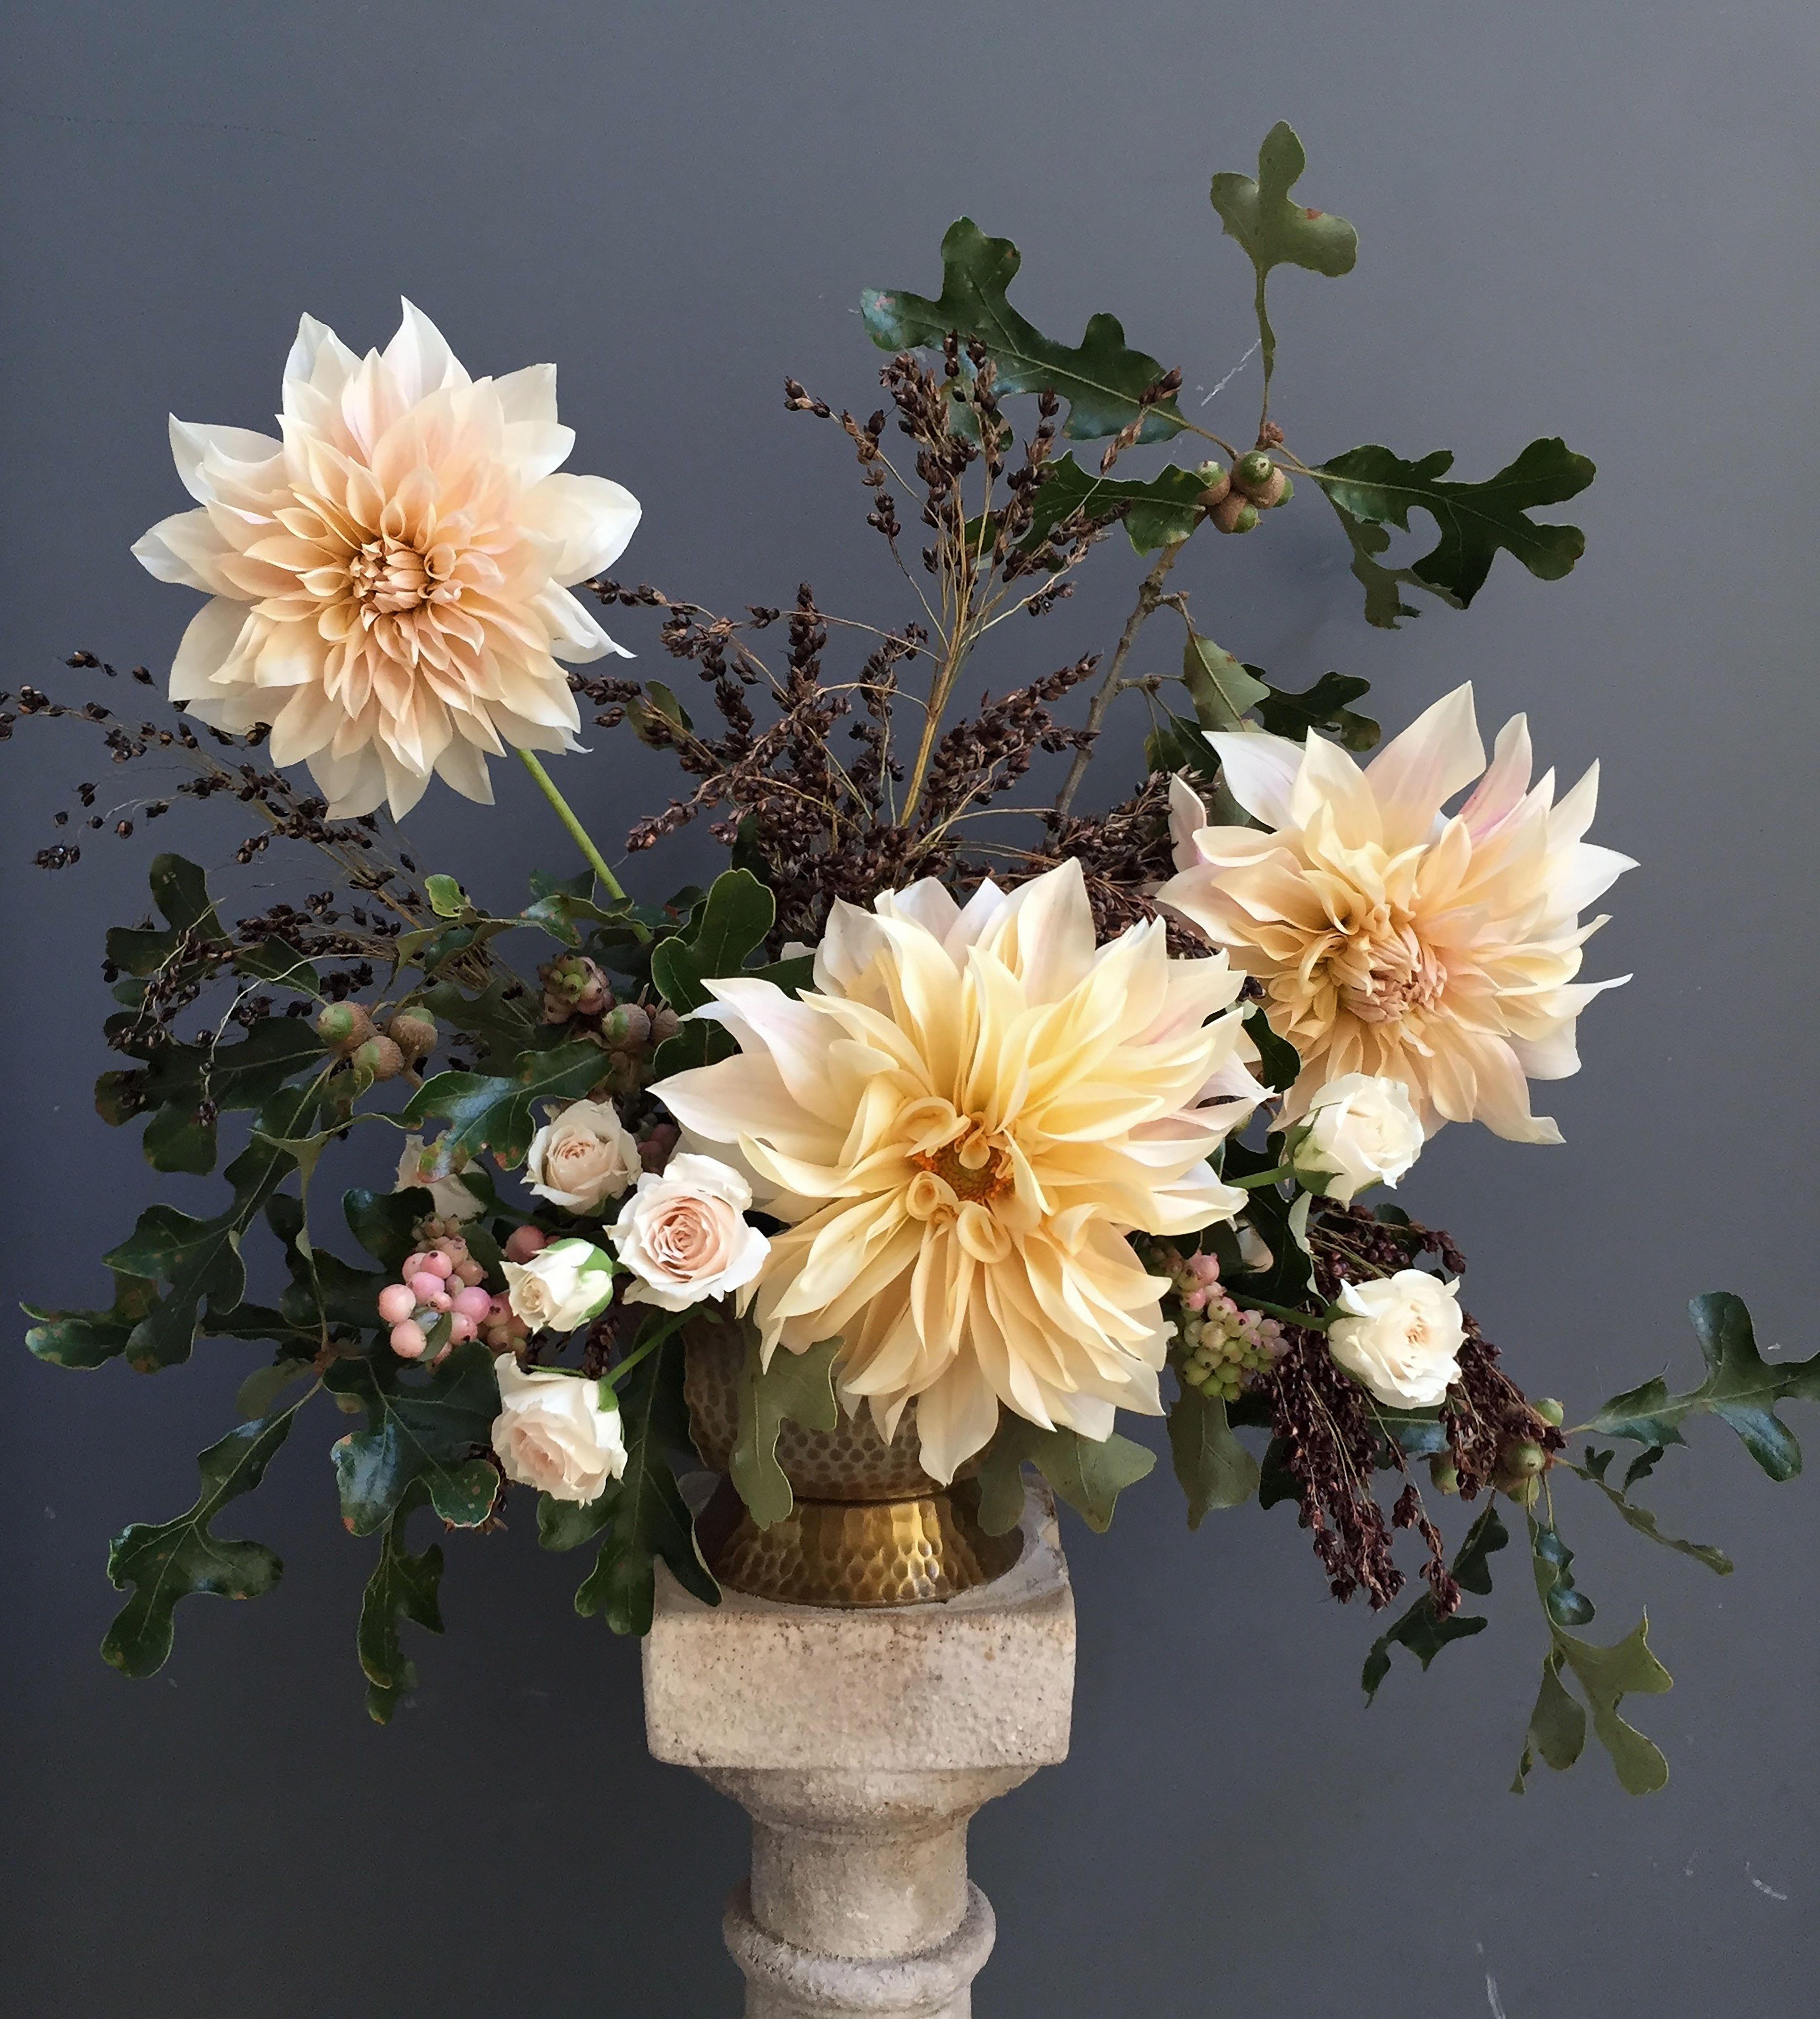 Fall flower arrangements flowers ideas for review Fall floral arrangements